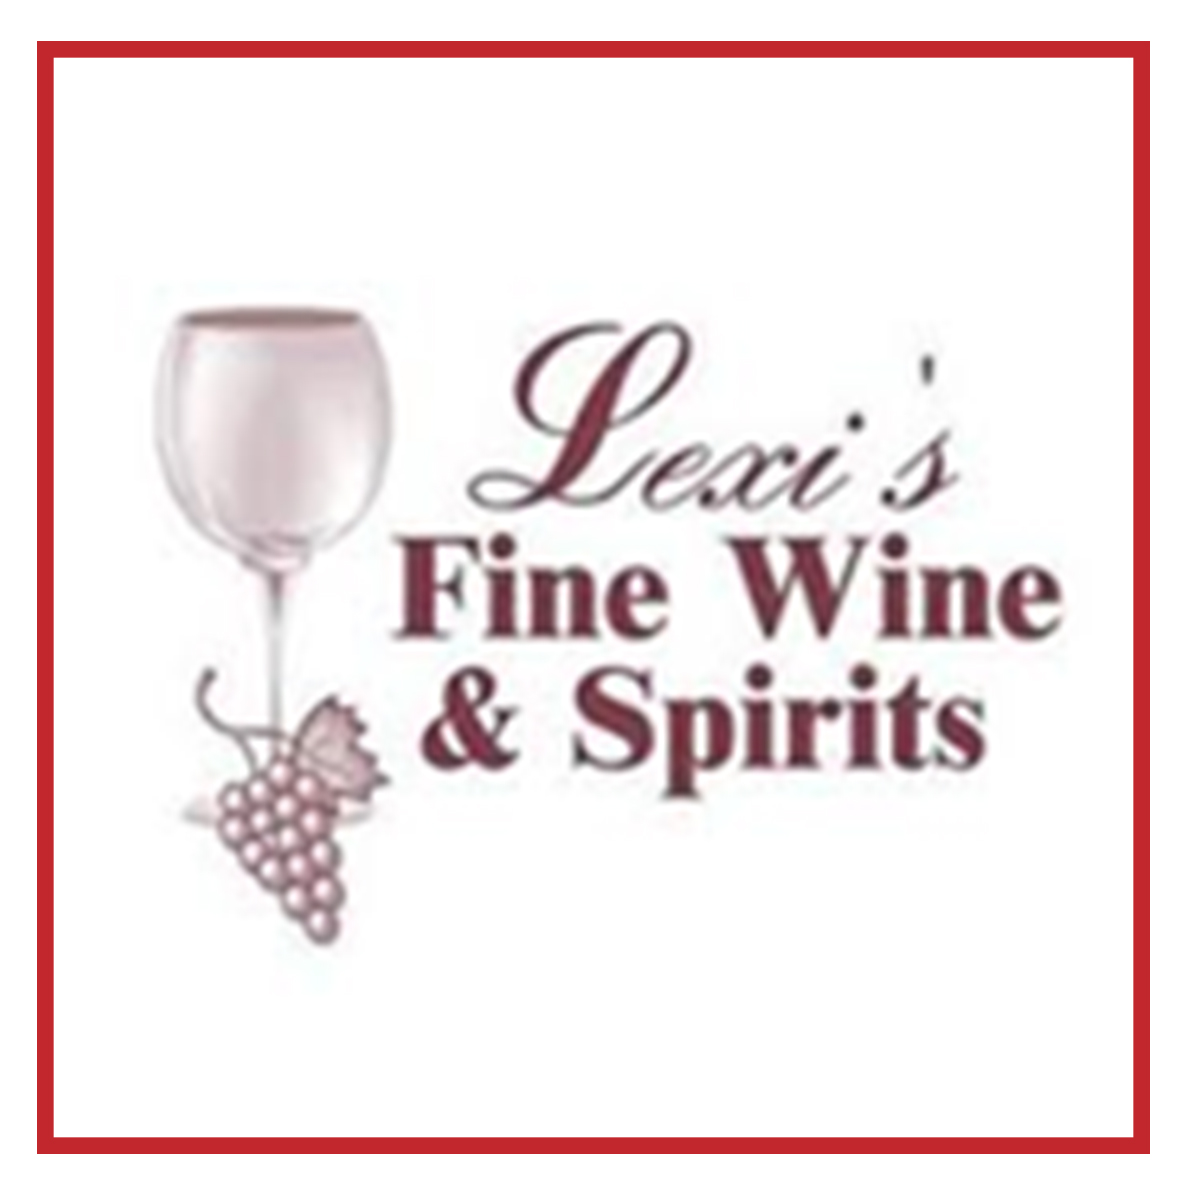 Lexi's Fine Wine & Spirits